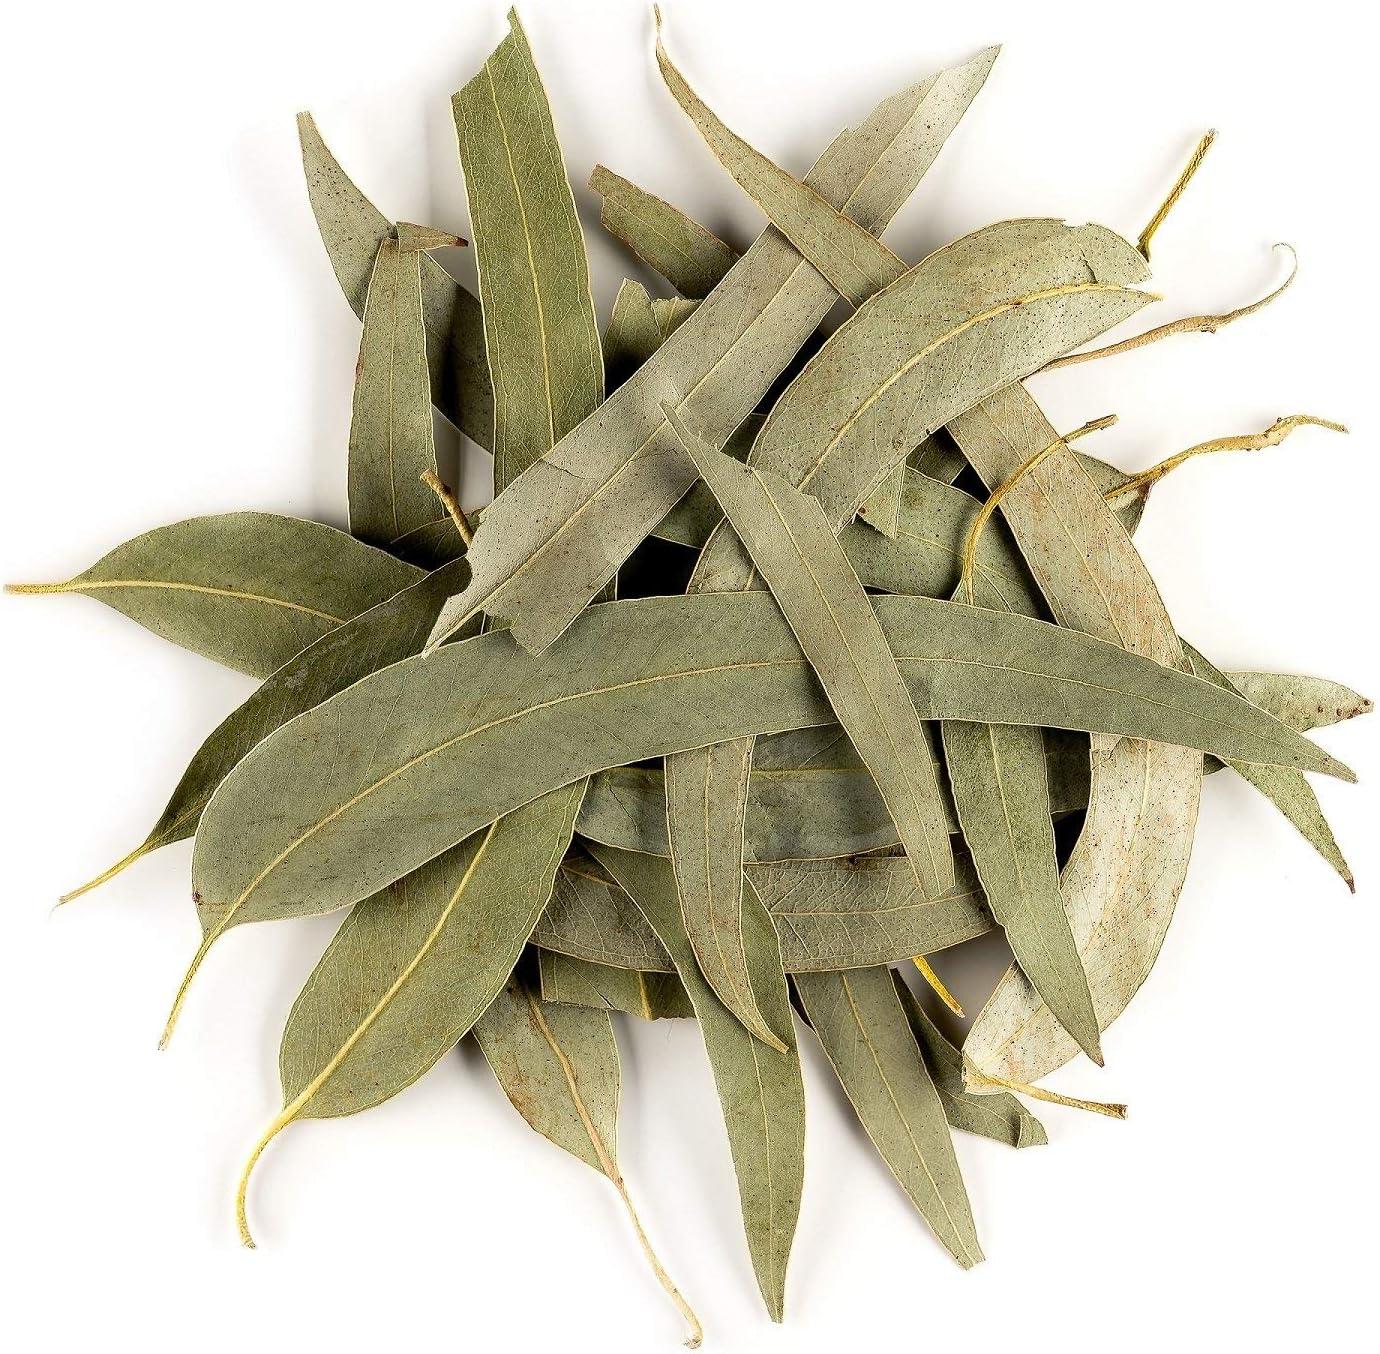 Eucalipto Hoja Suelta Infusión Orgánico - Suave Y Balsámico Para La Garganta - Eucalyptus Bio Eucaliptus 50g